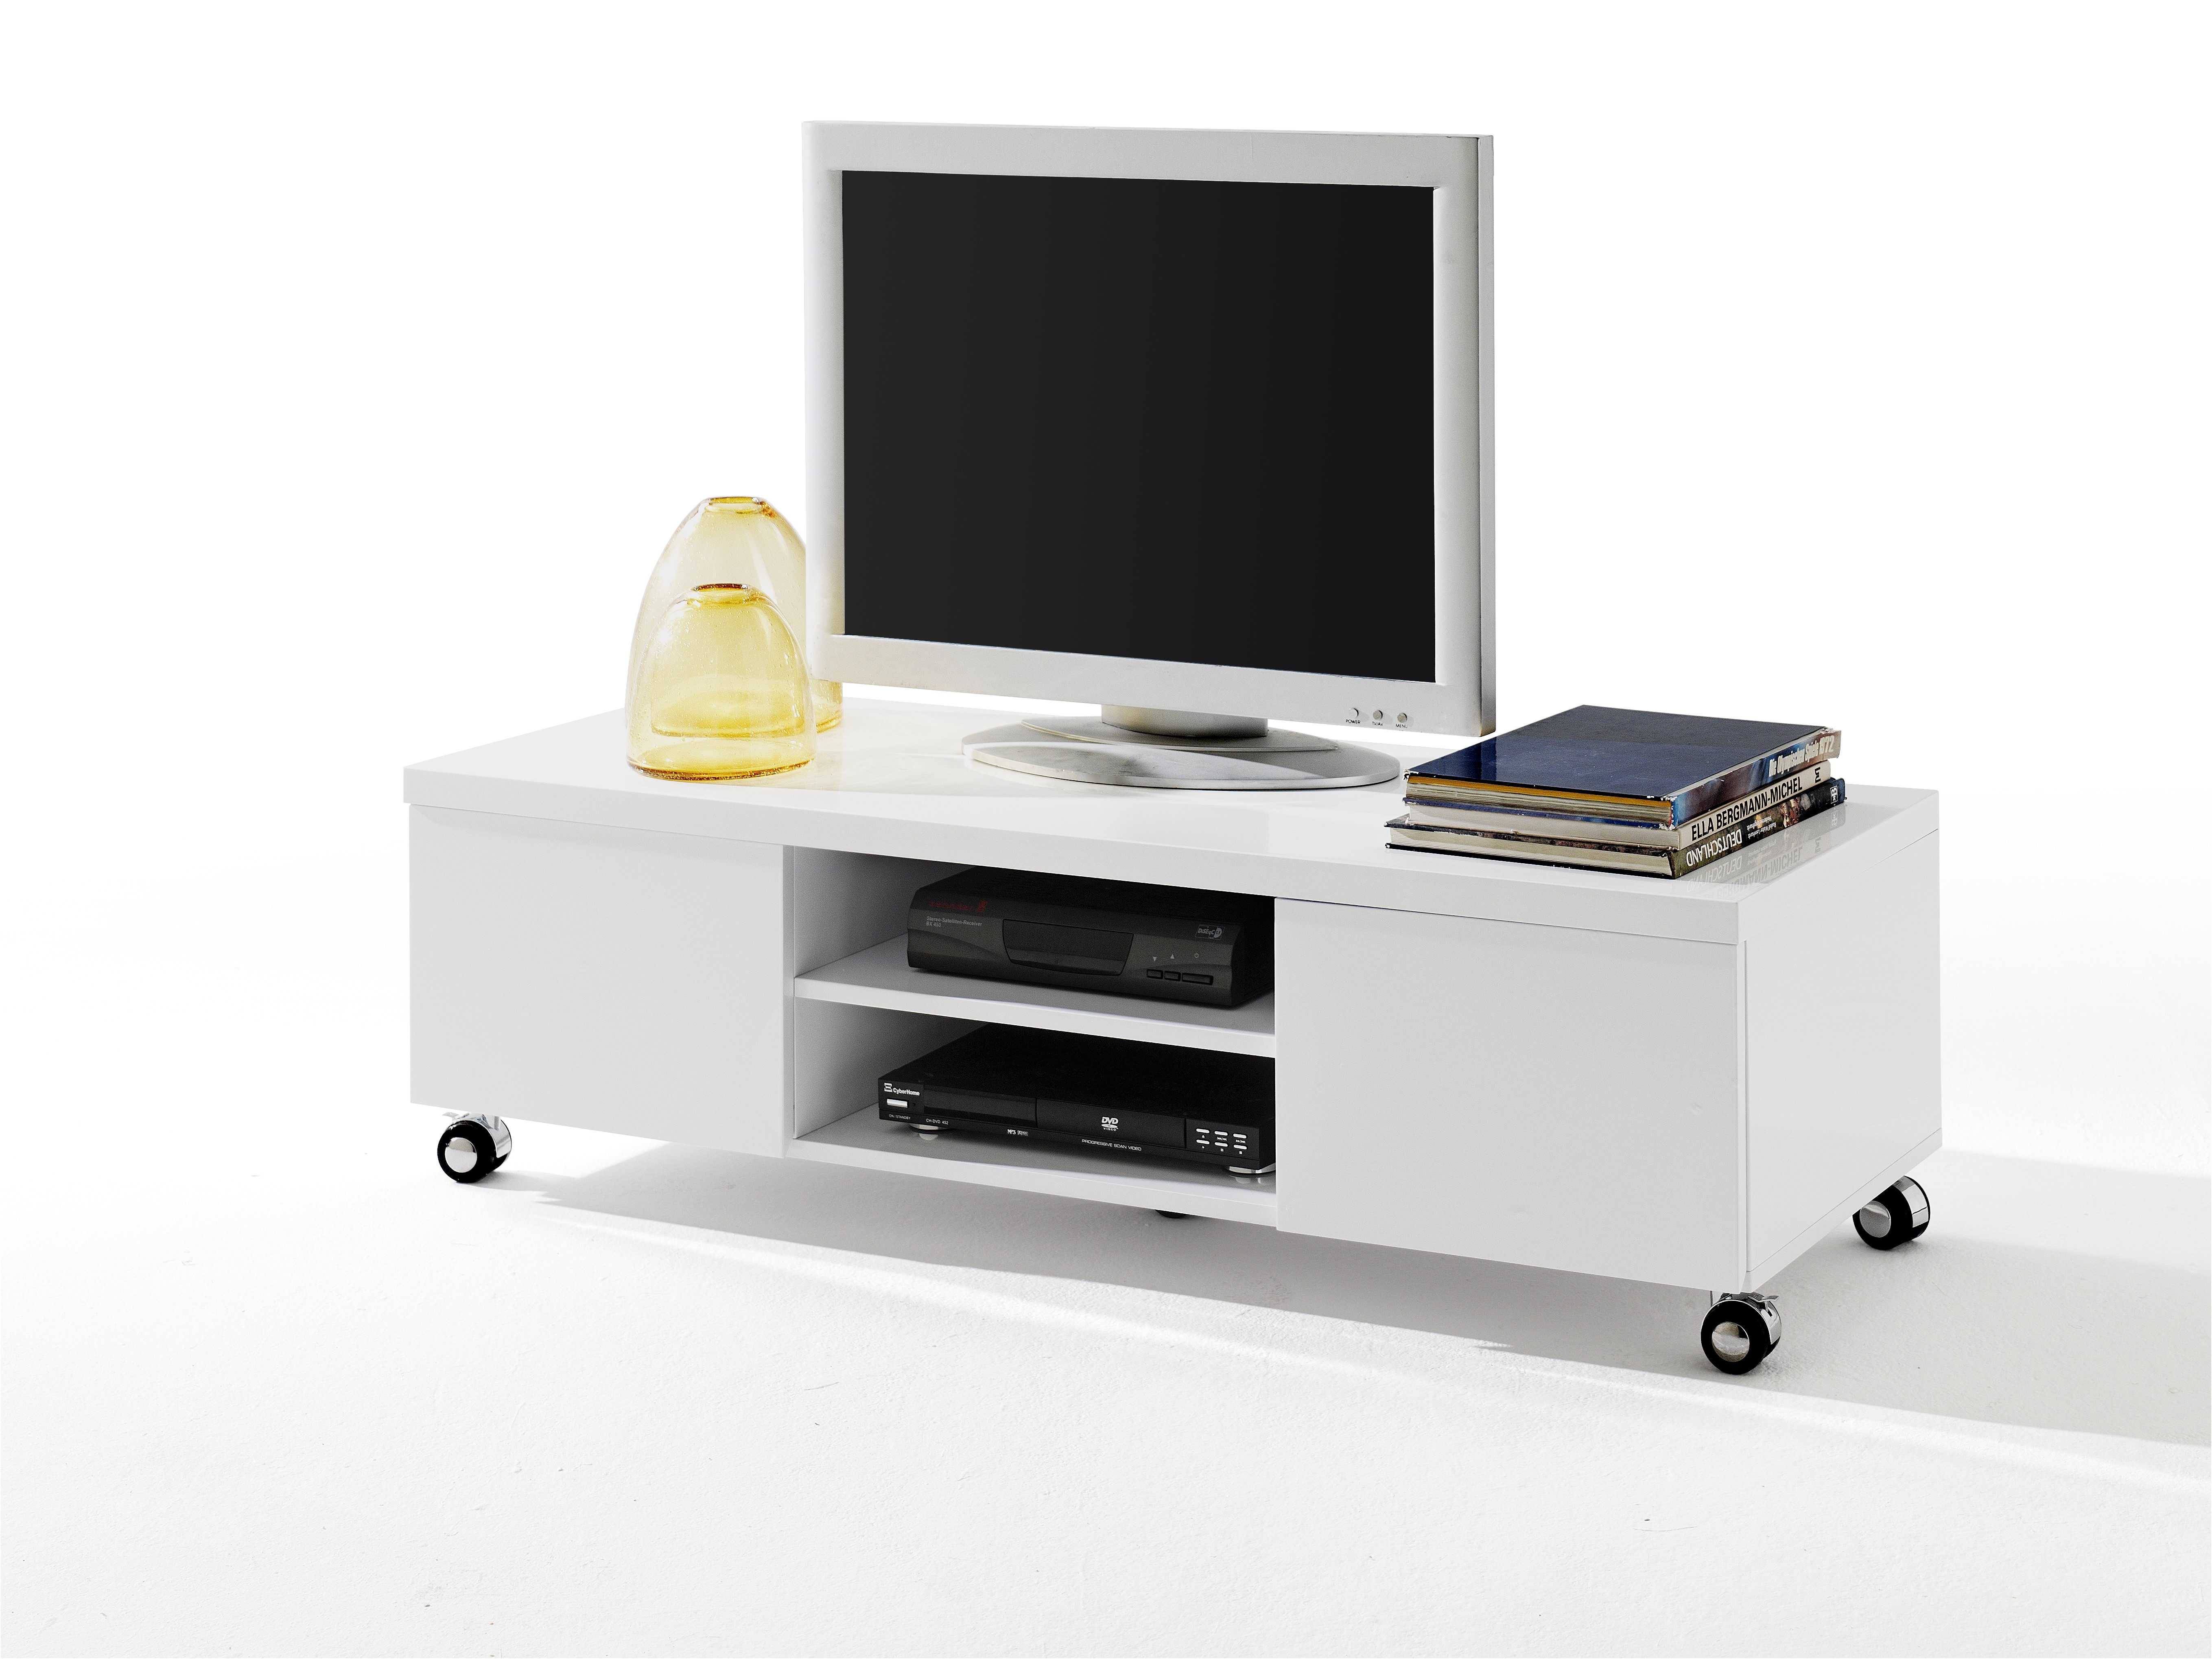 Tv Meubel Wieltjes : Tv meubel hella hg wit wieltjes meubelen de keizer